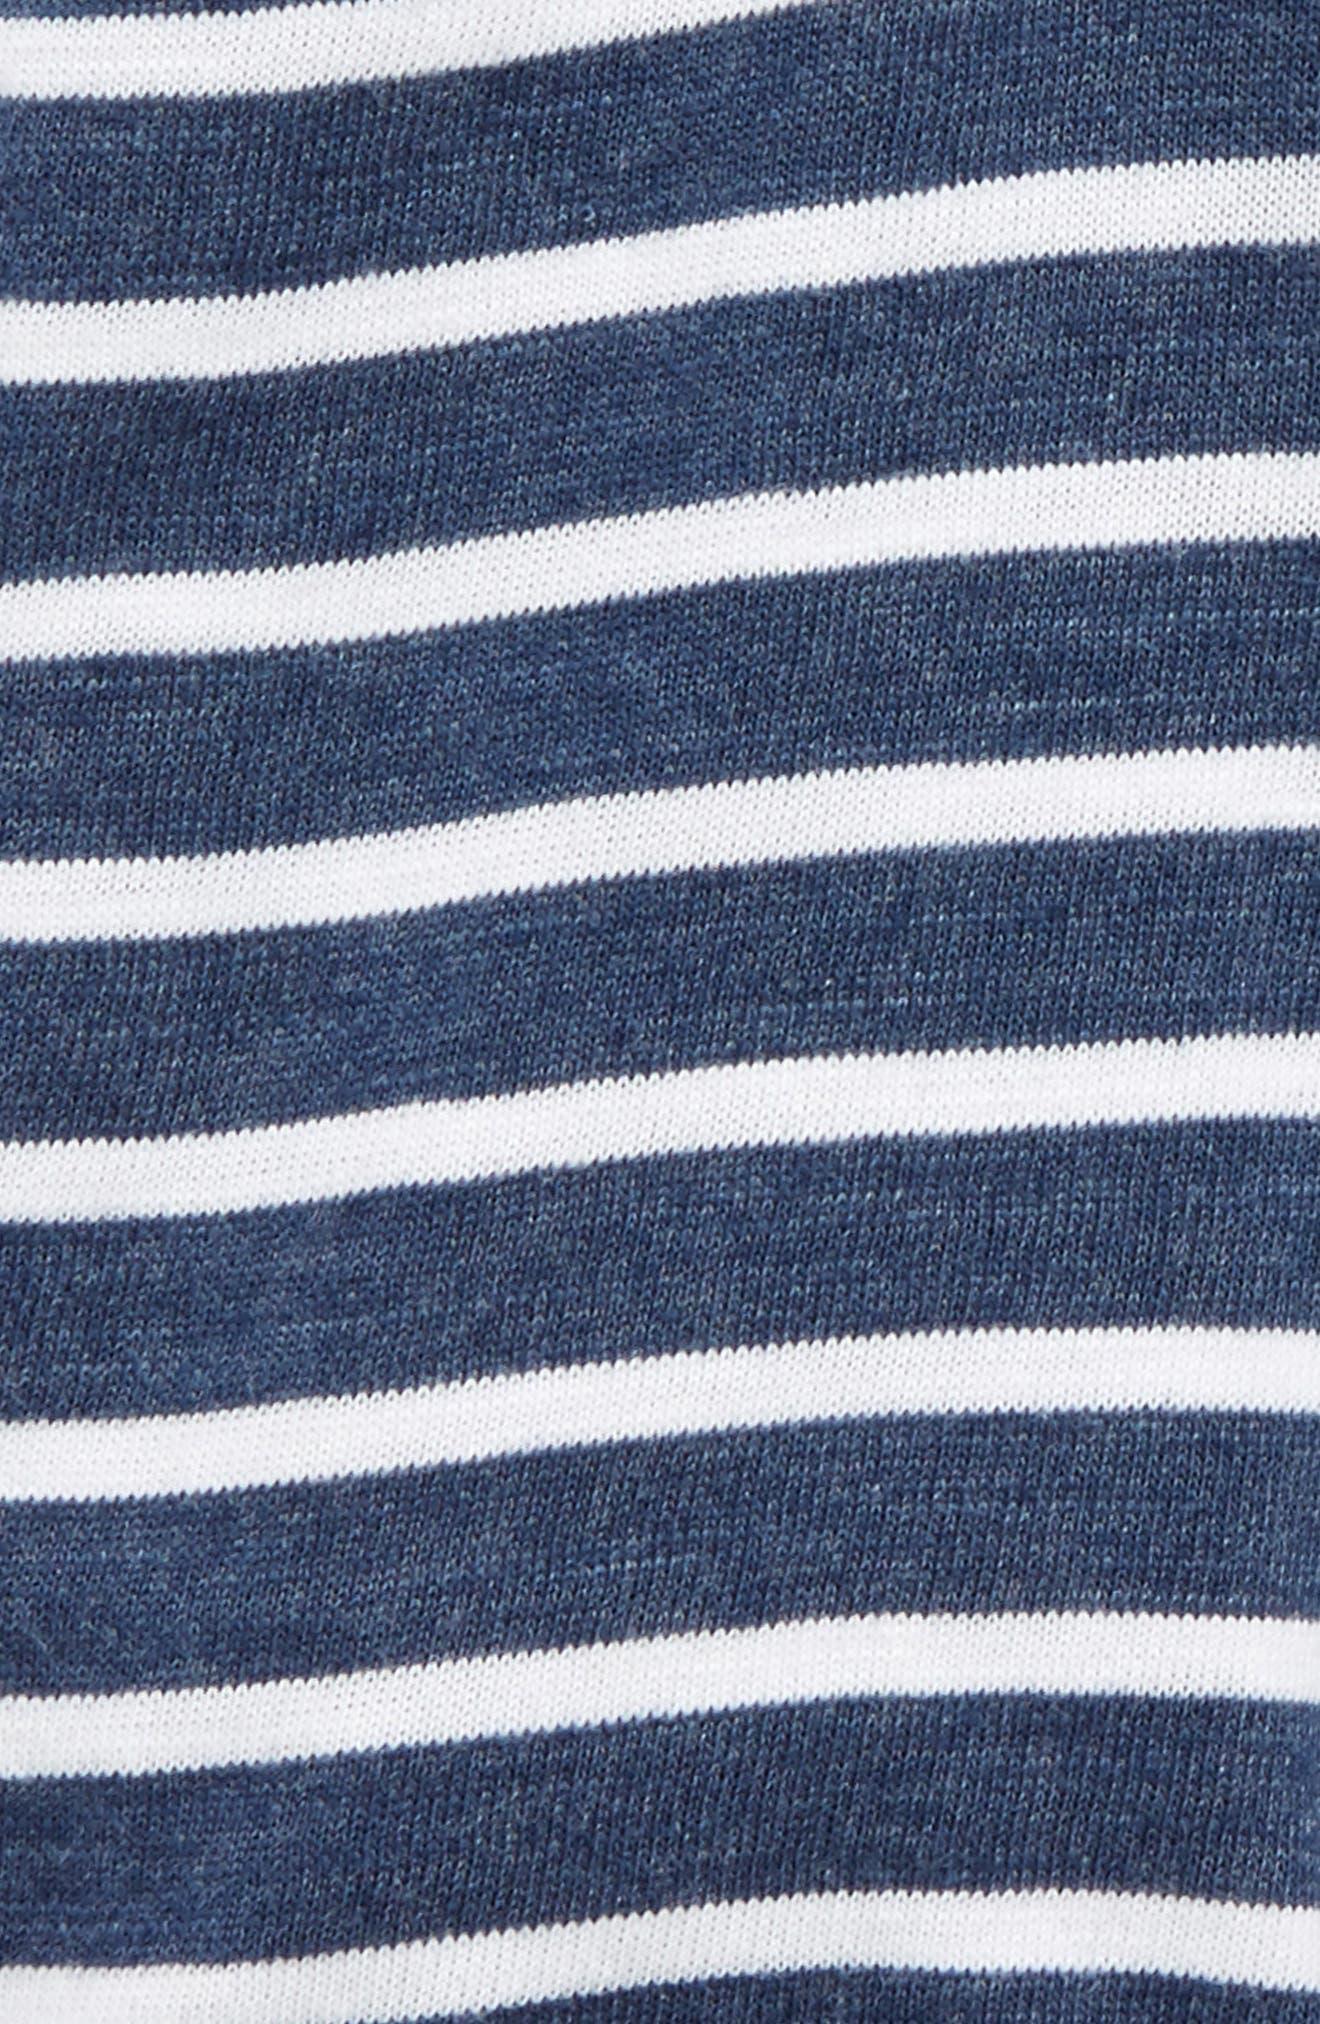 Stripe Shorts,                             Alternate thumbnail 2, color,                             Navy Striped